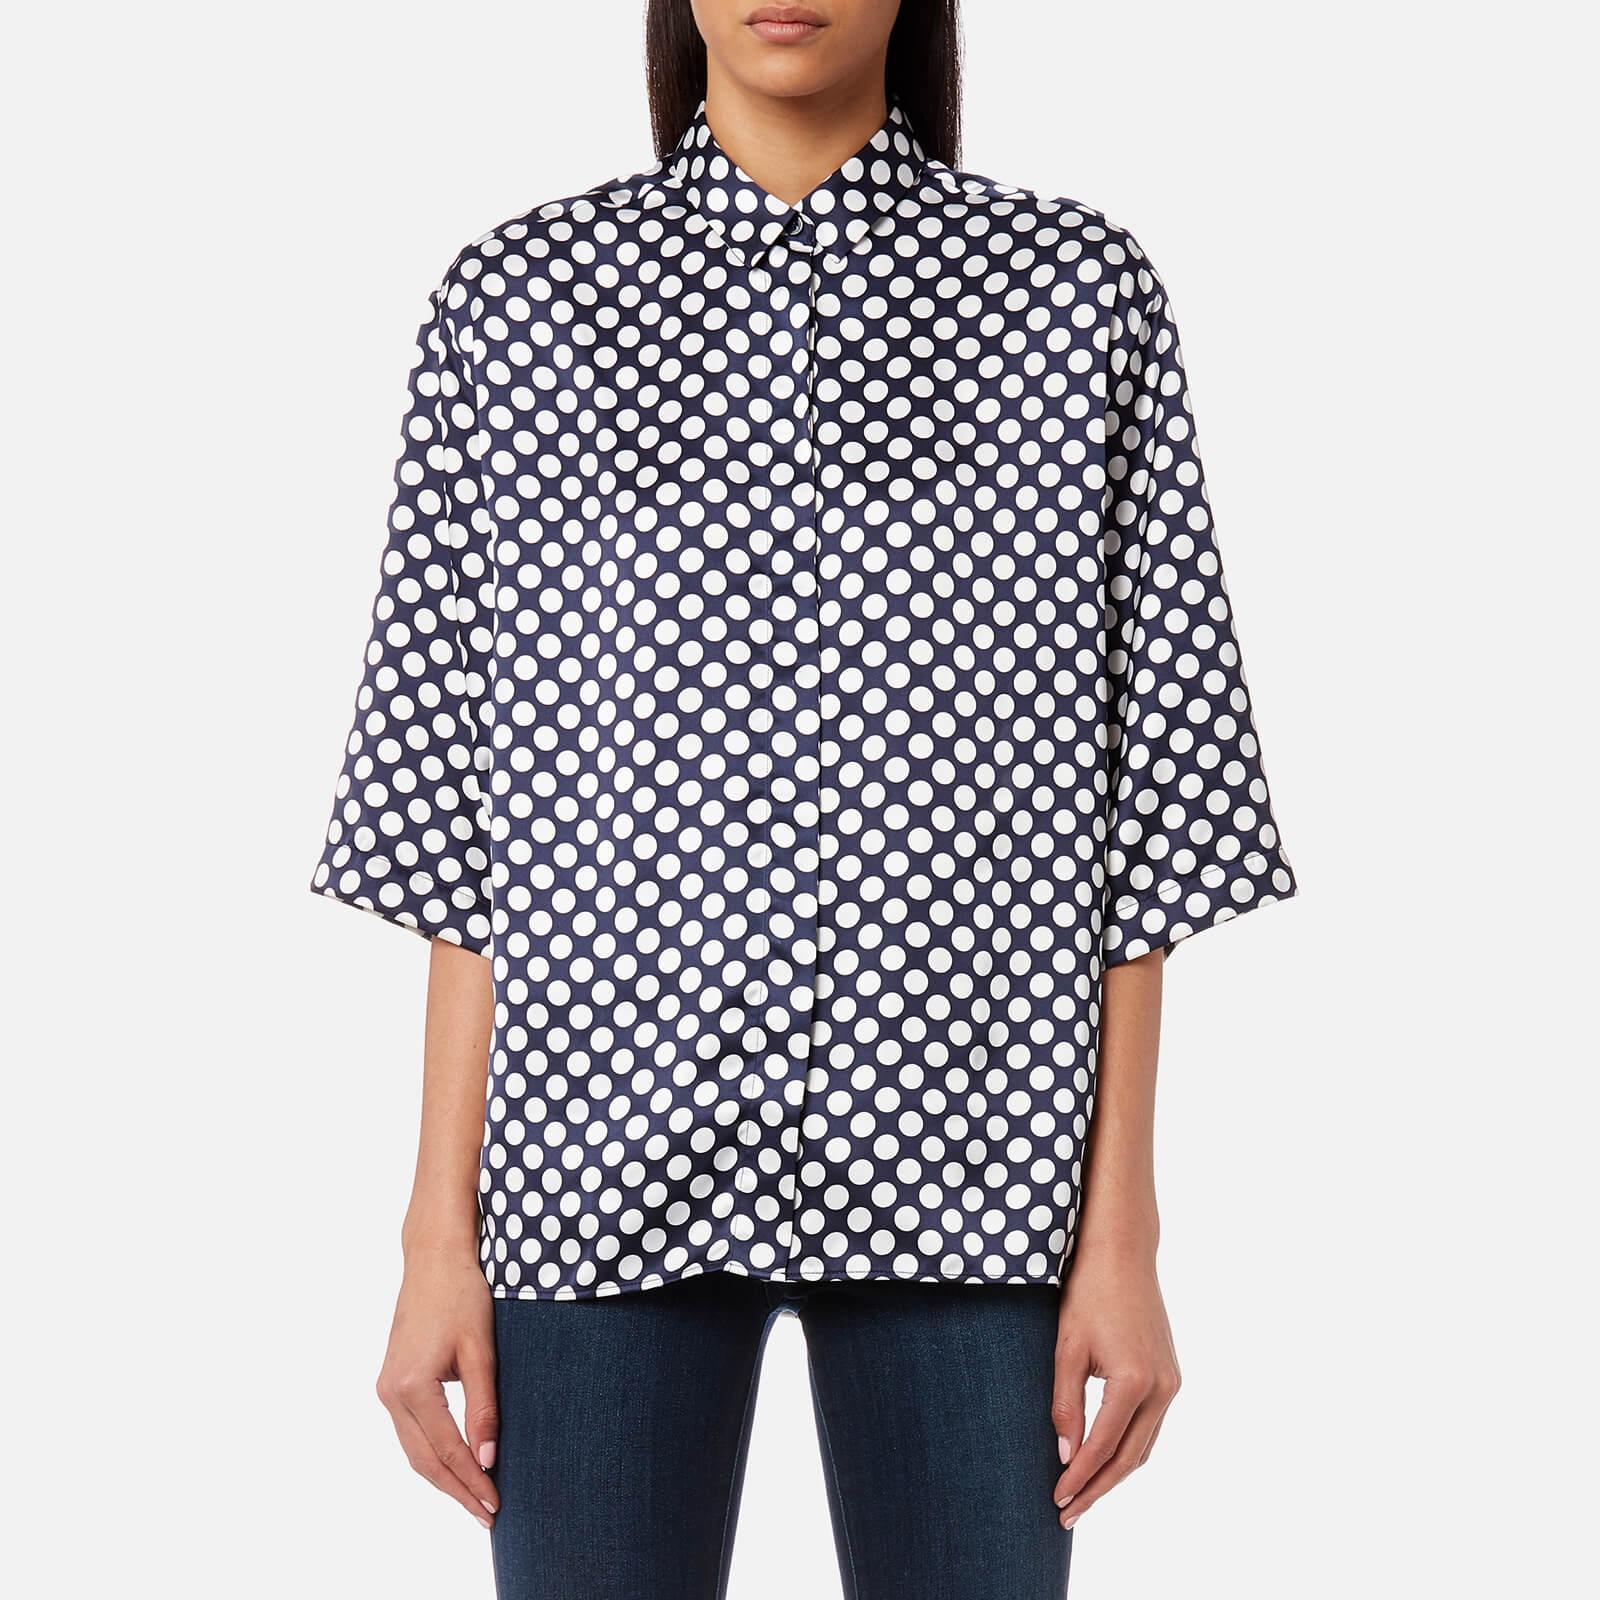 PS by Paul Smith Women's Spot Shirt - Navy